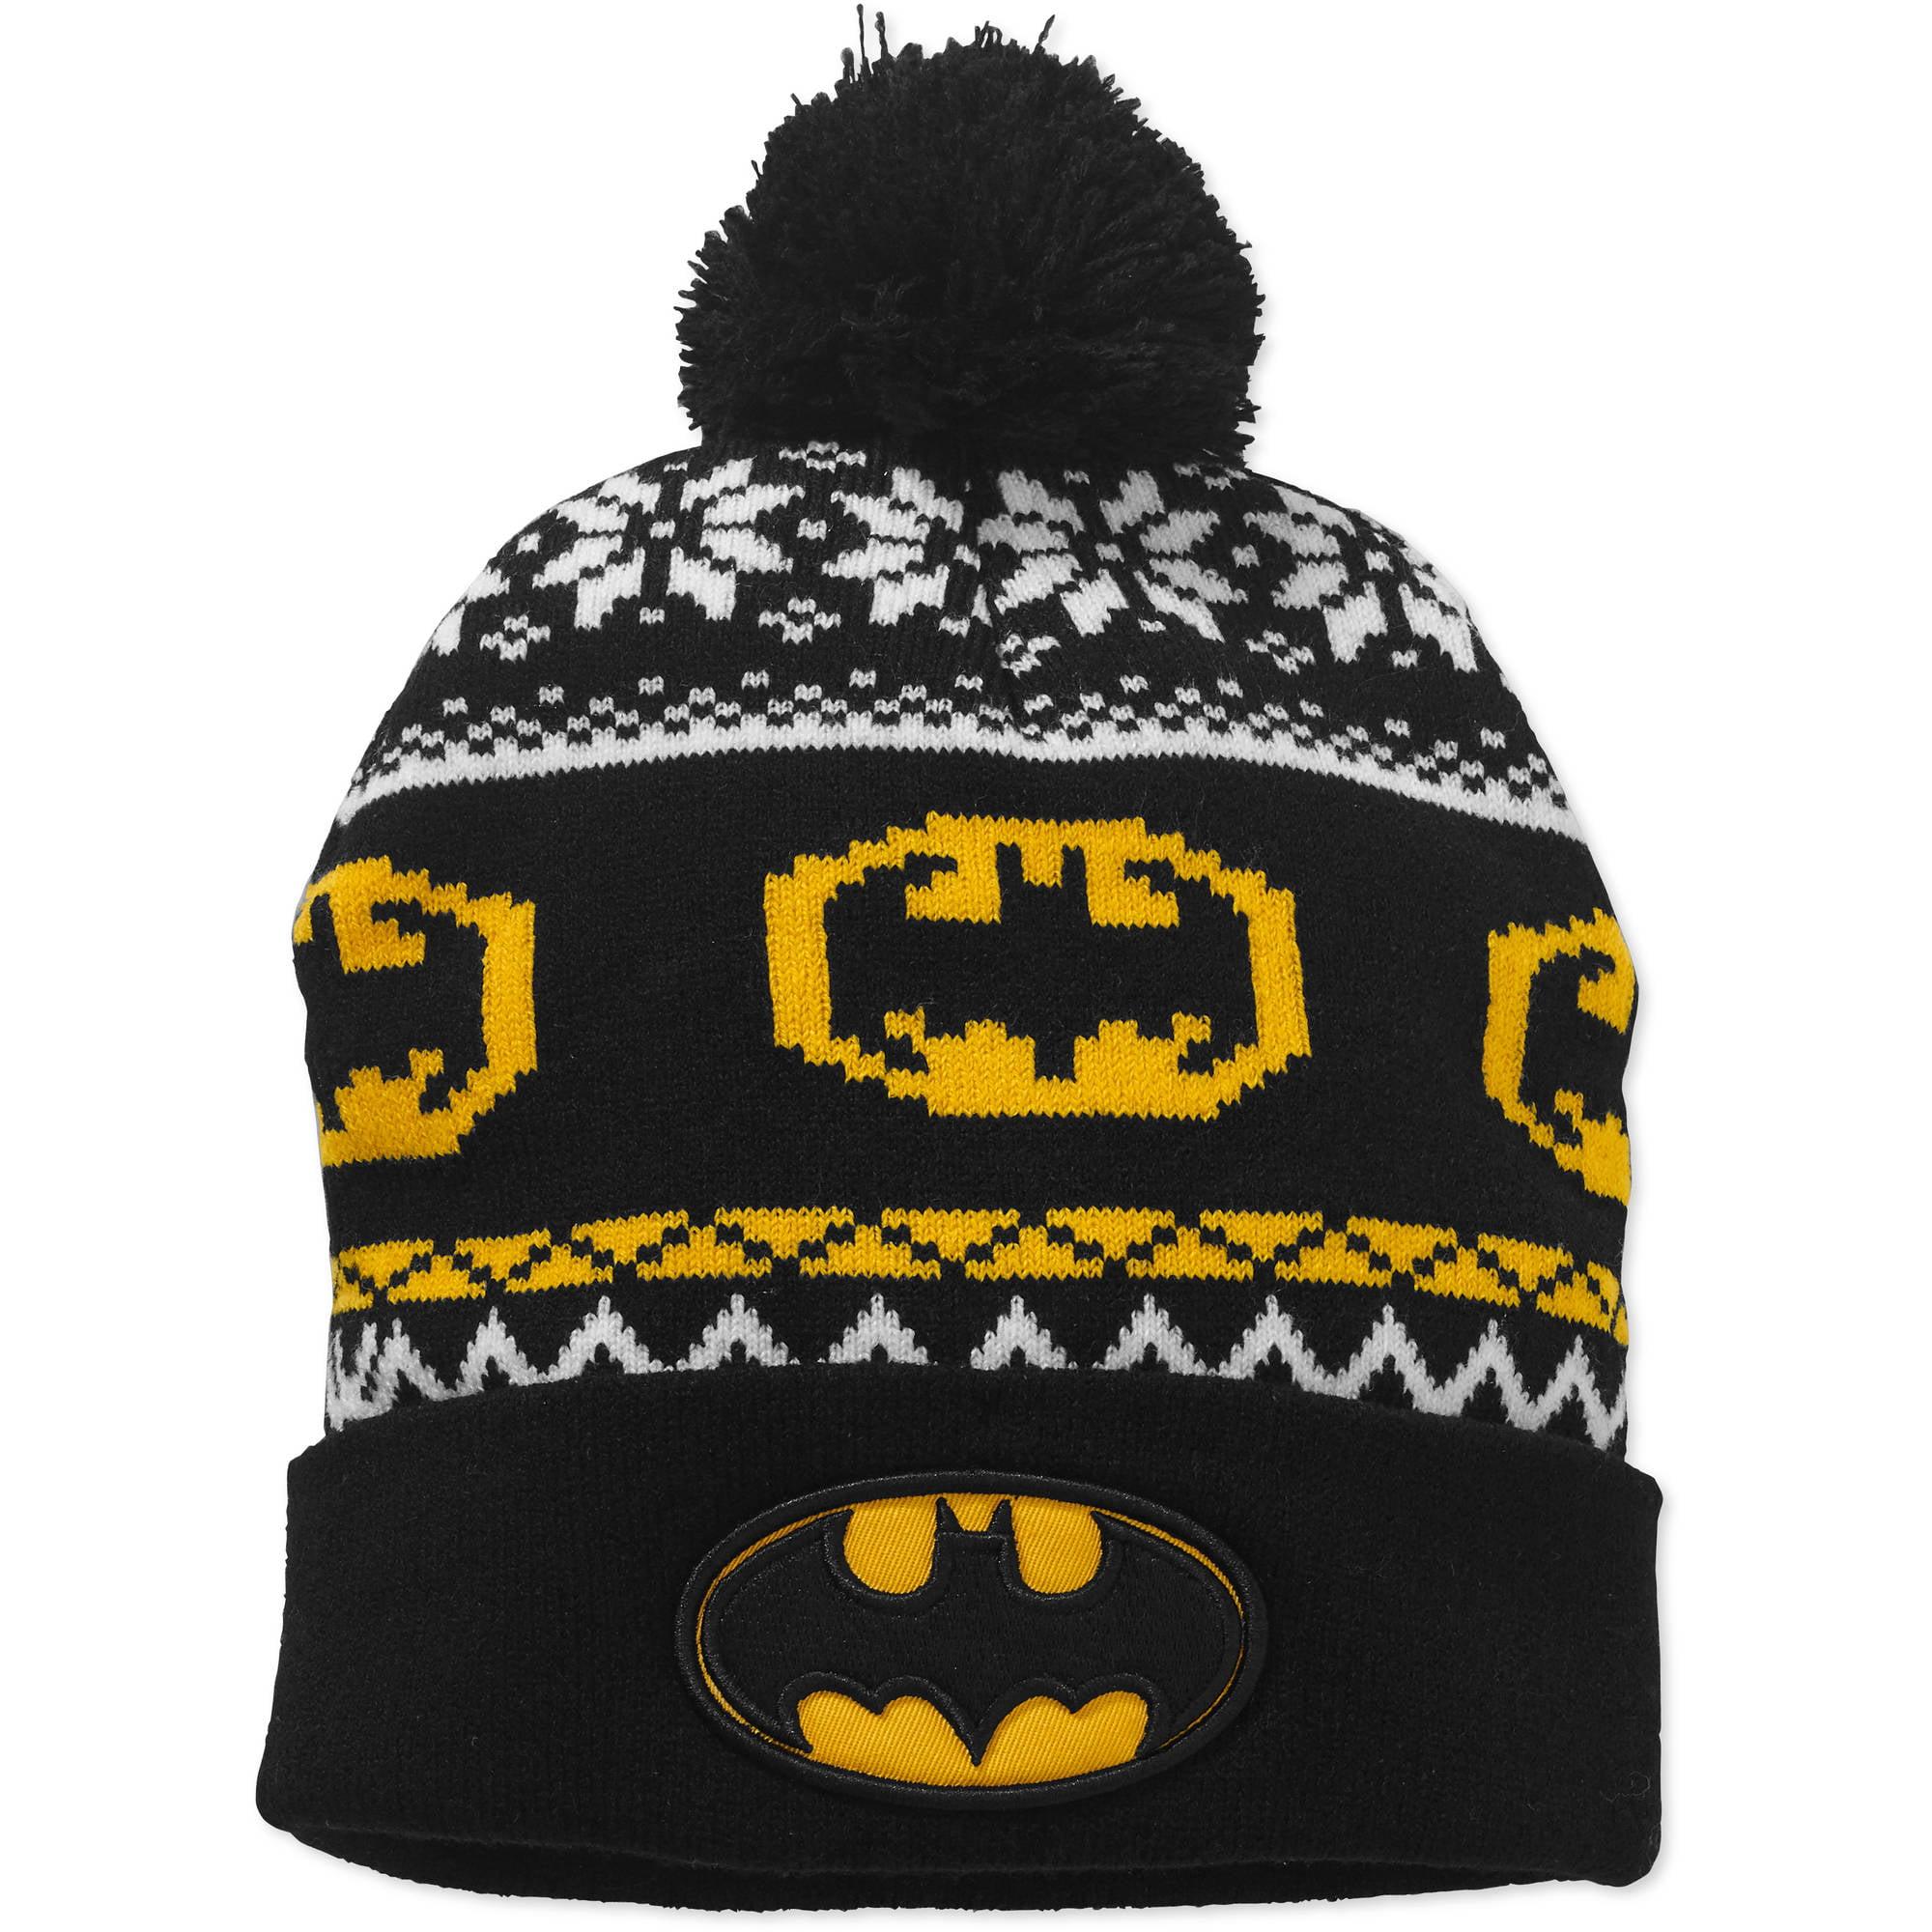 Women's Batman Cuff Pom Knit Hat